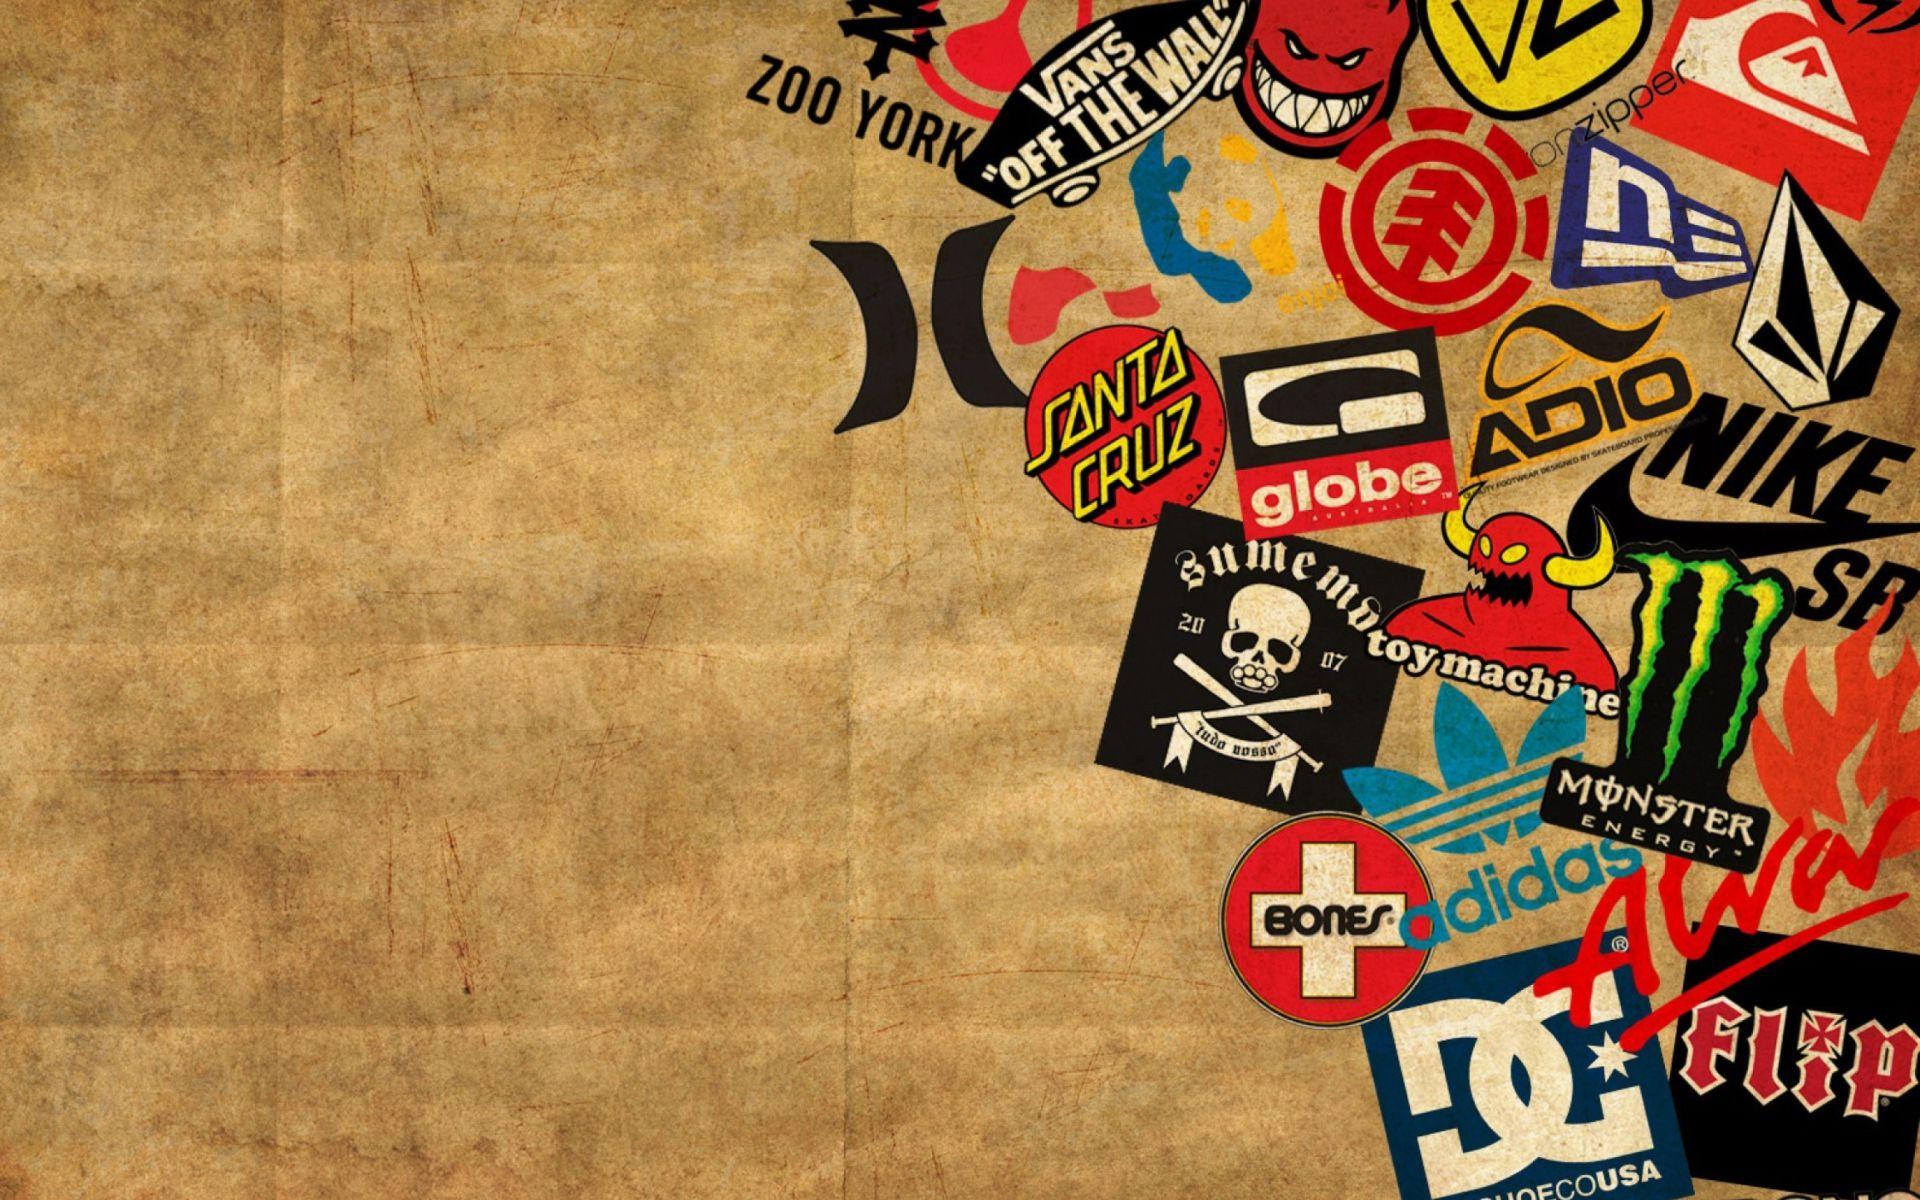 Aaryxi Wallpaper Para Pc Wallpapers Para Pc Fundos Para Pc Walpaper Para Pc